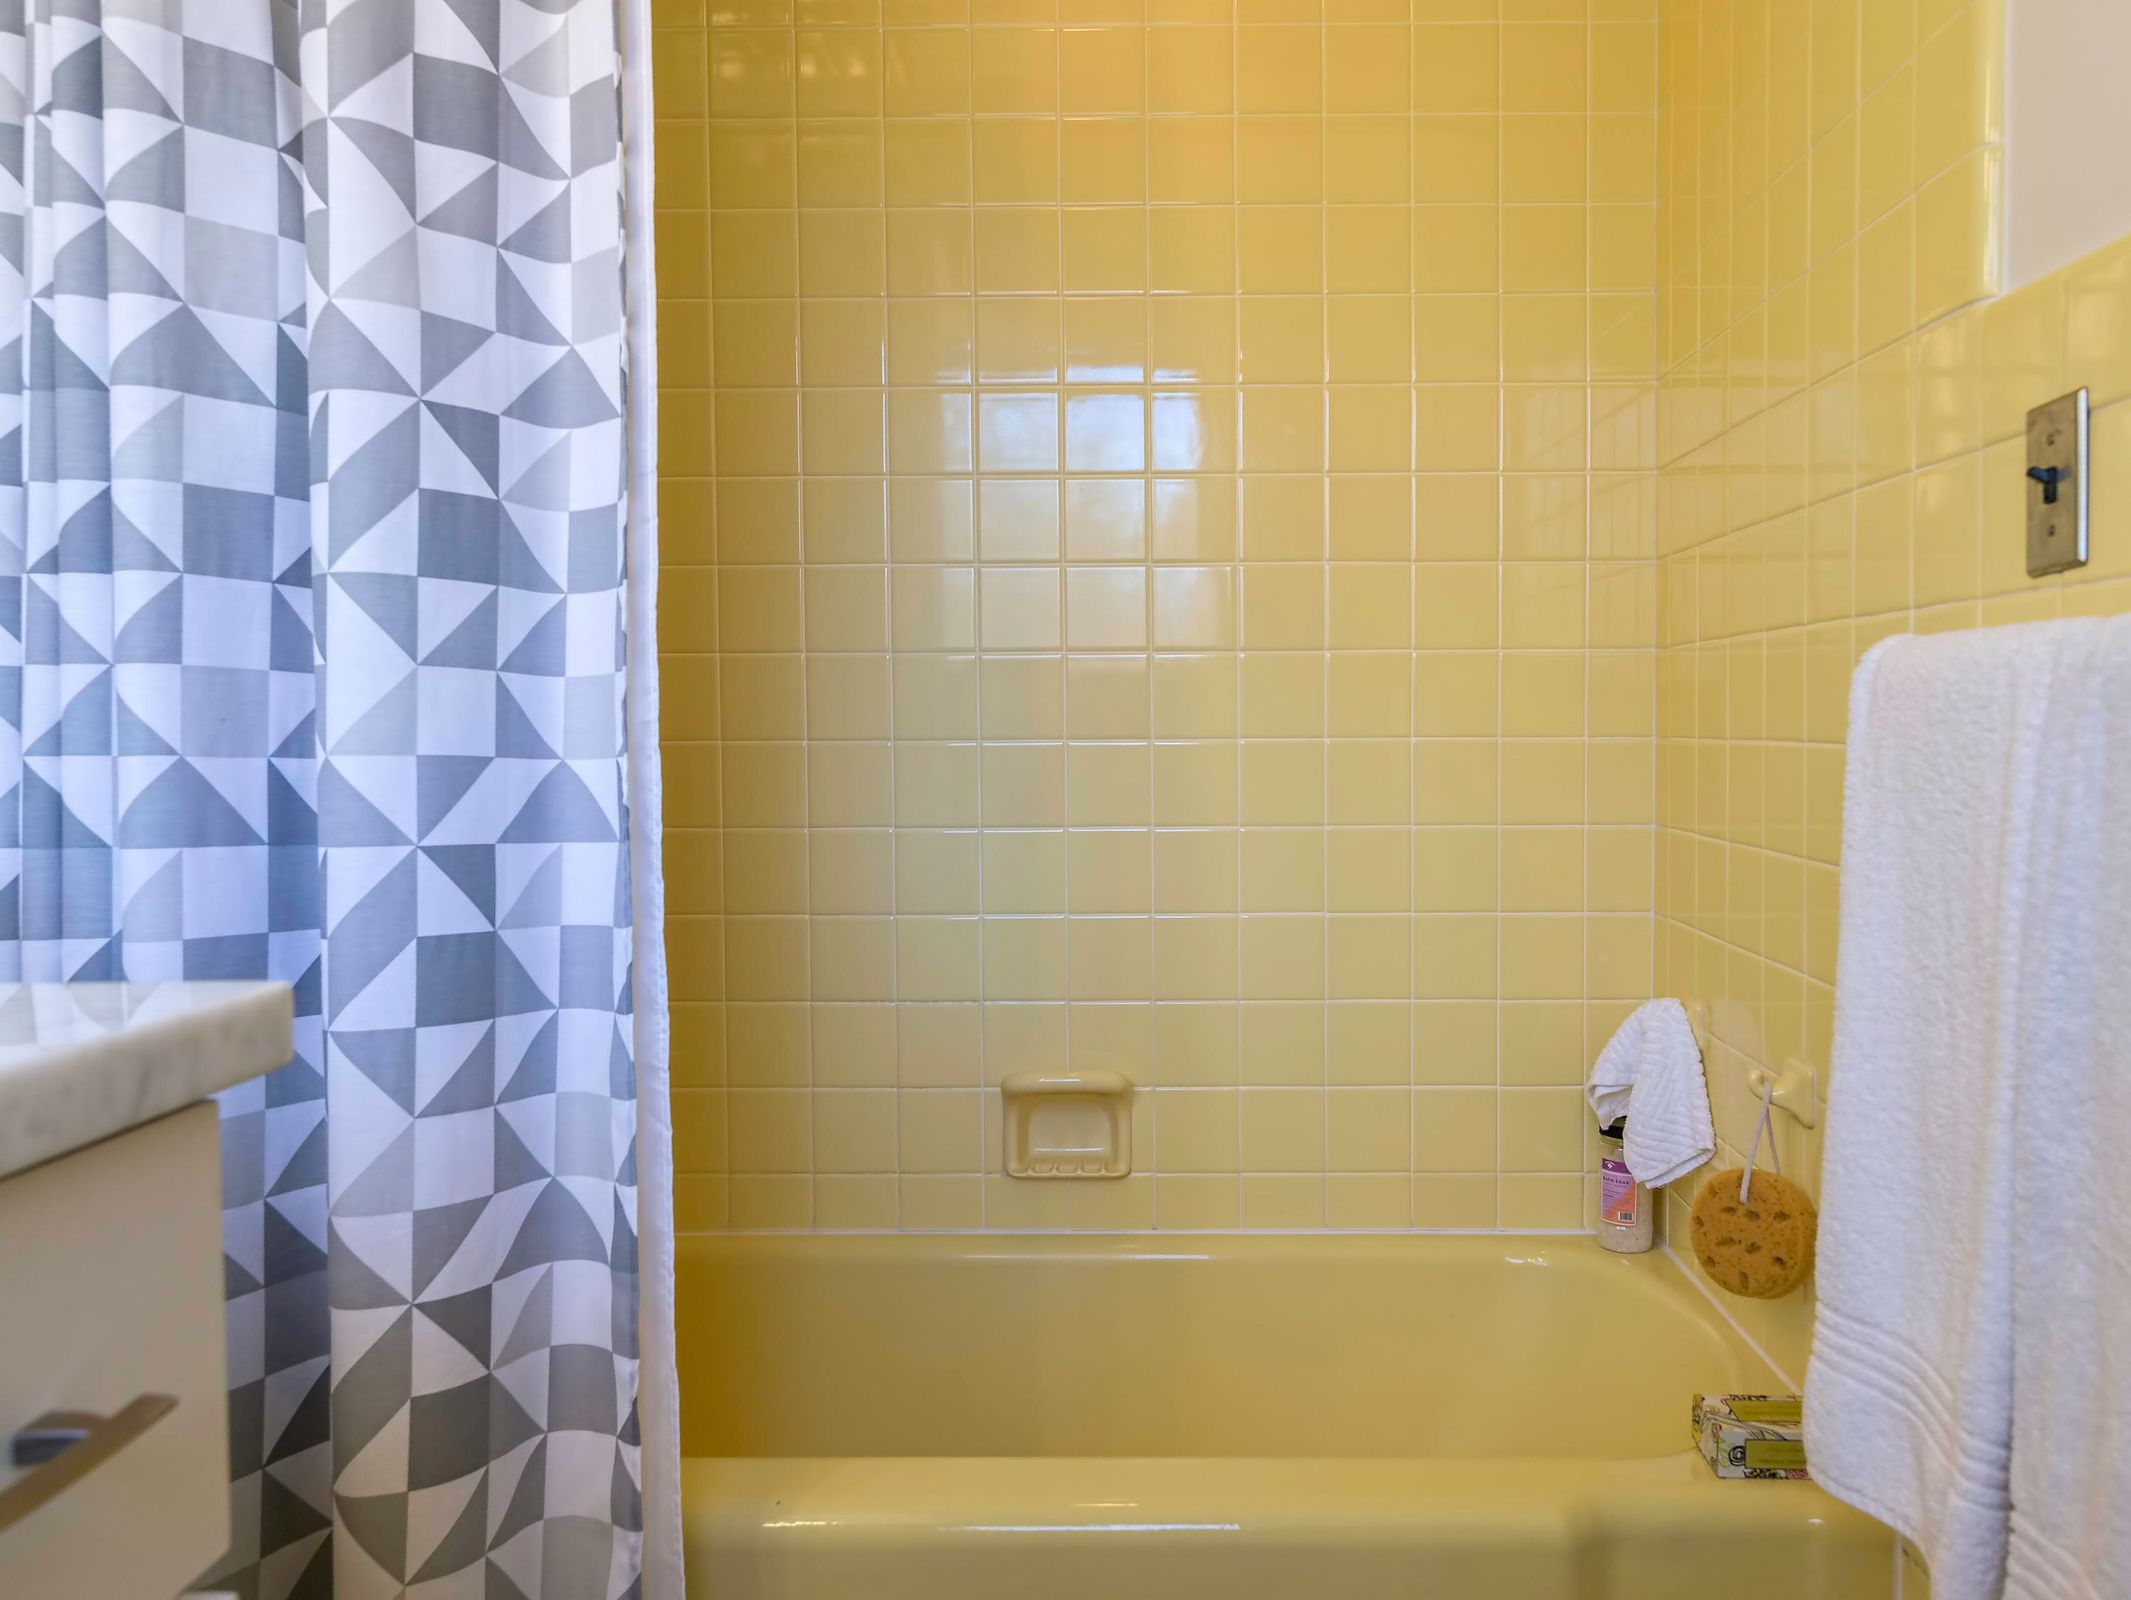 DSC_2315 - Bathroom 2